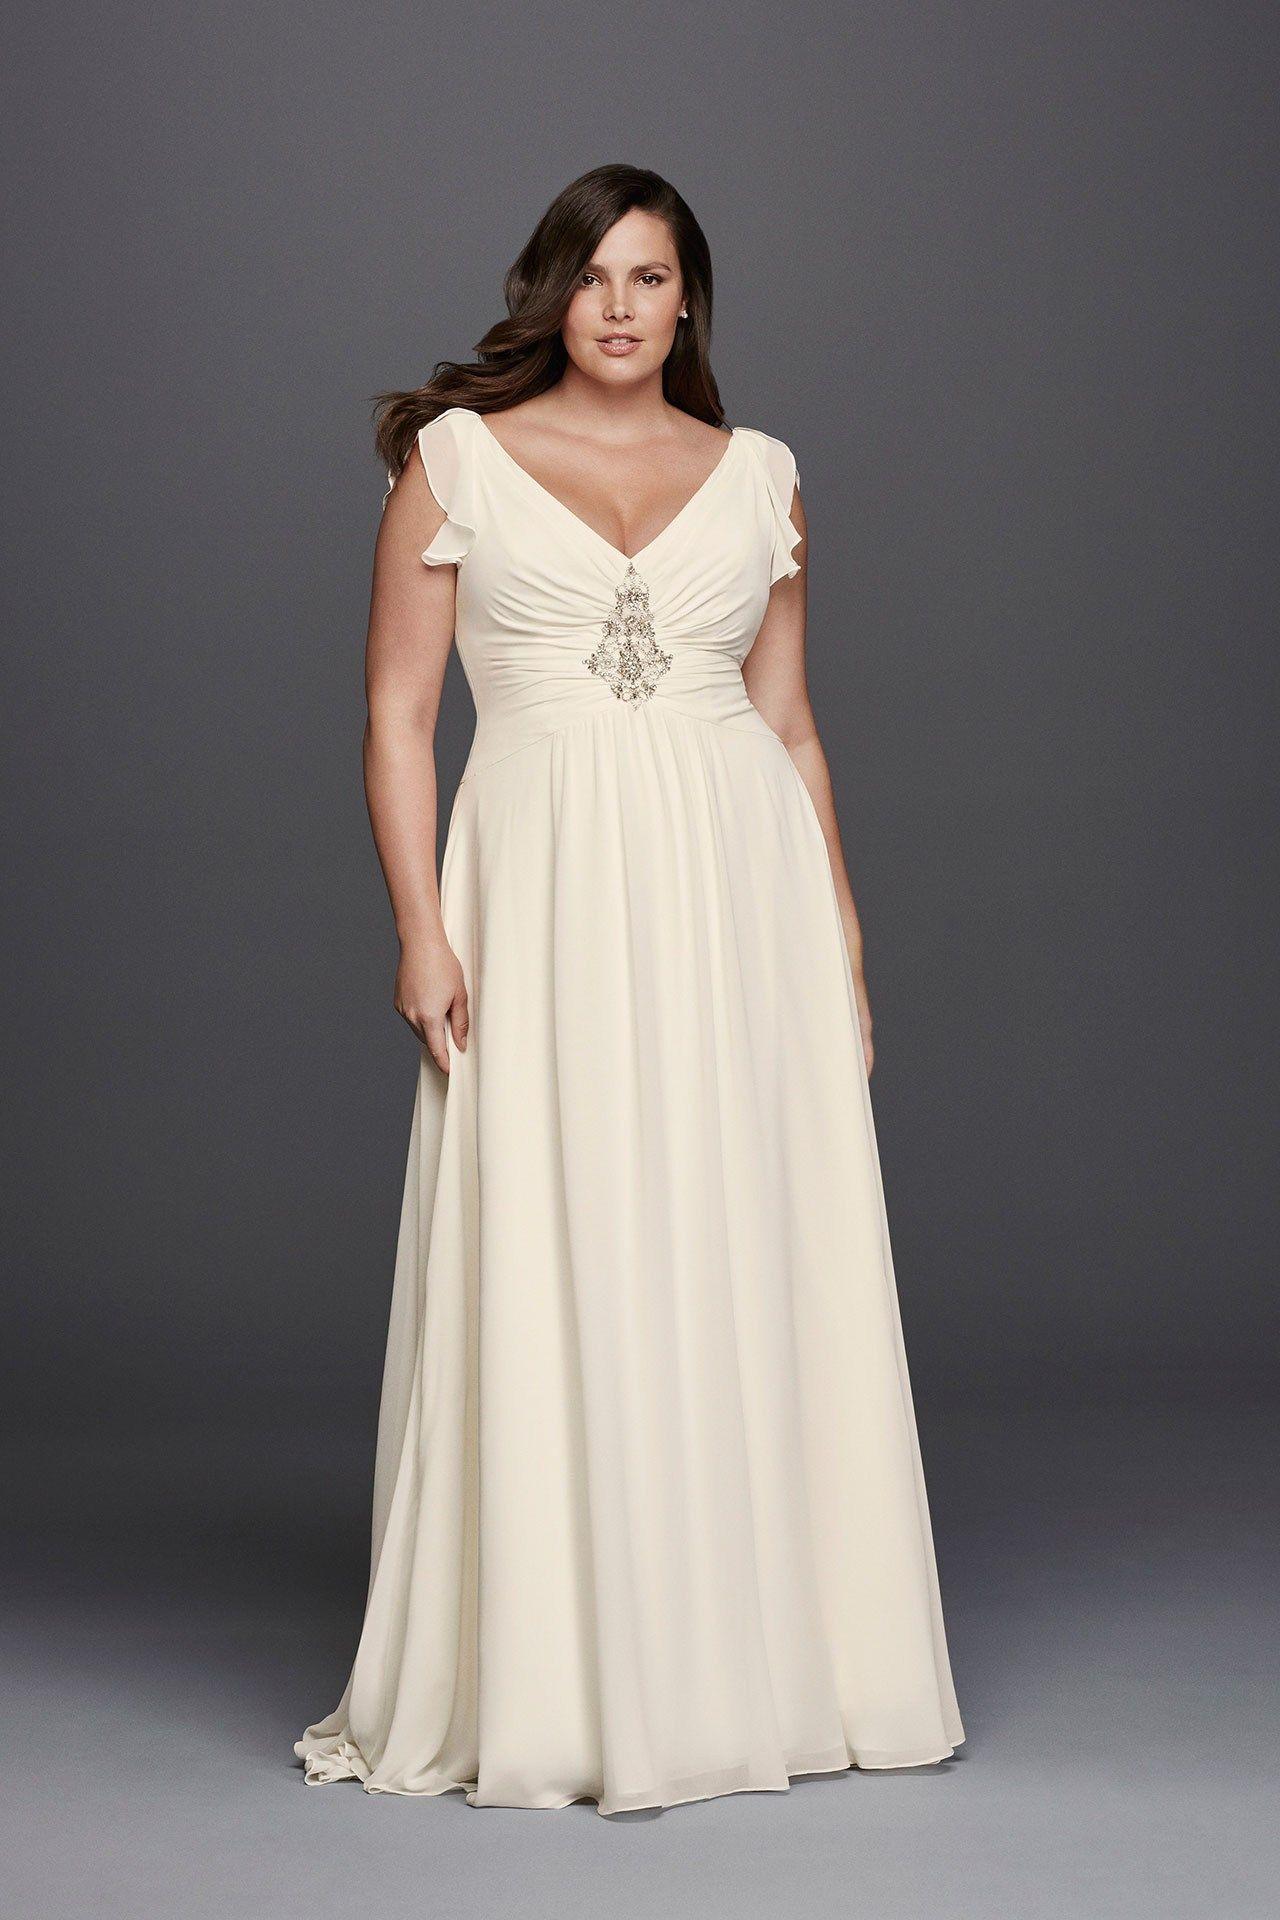 Jenny Packham X David S Bridal New Bridal Collection Kate Middleton S Favorite Designe Jenny Packham Wedding Dresses Wedding Dresses Plus Size Wedding Gowns [ 1920 x 1280 Pixel ]